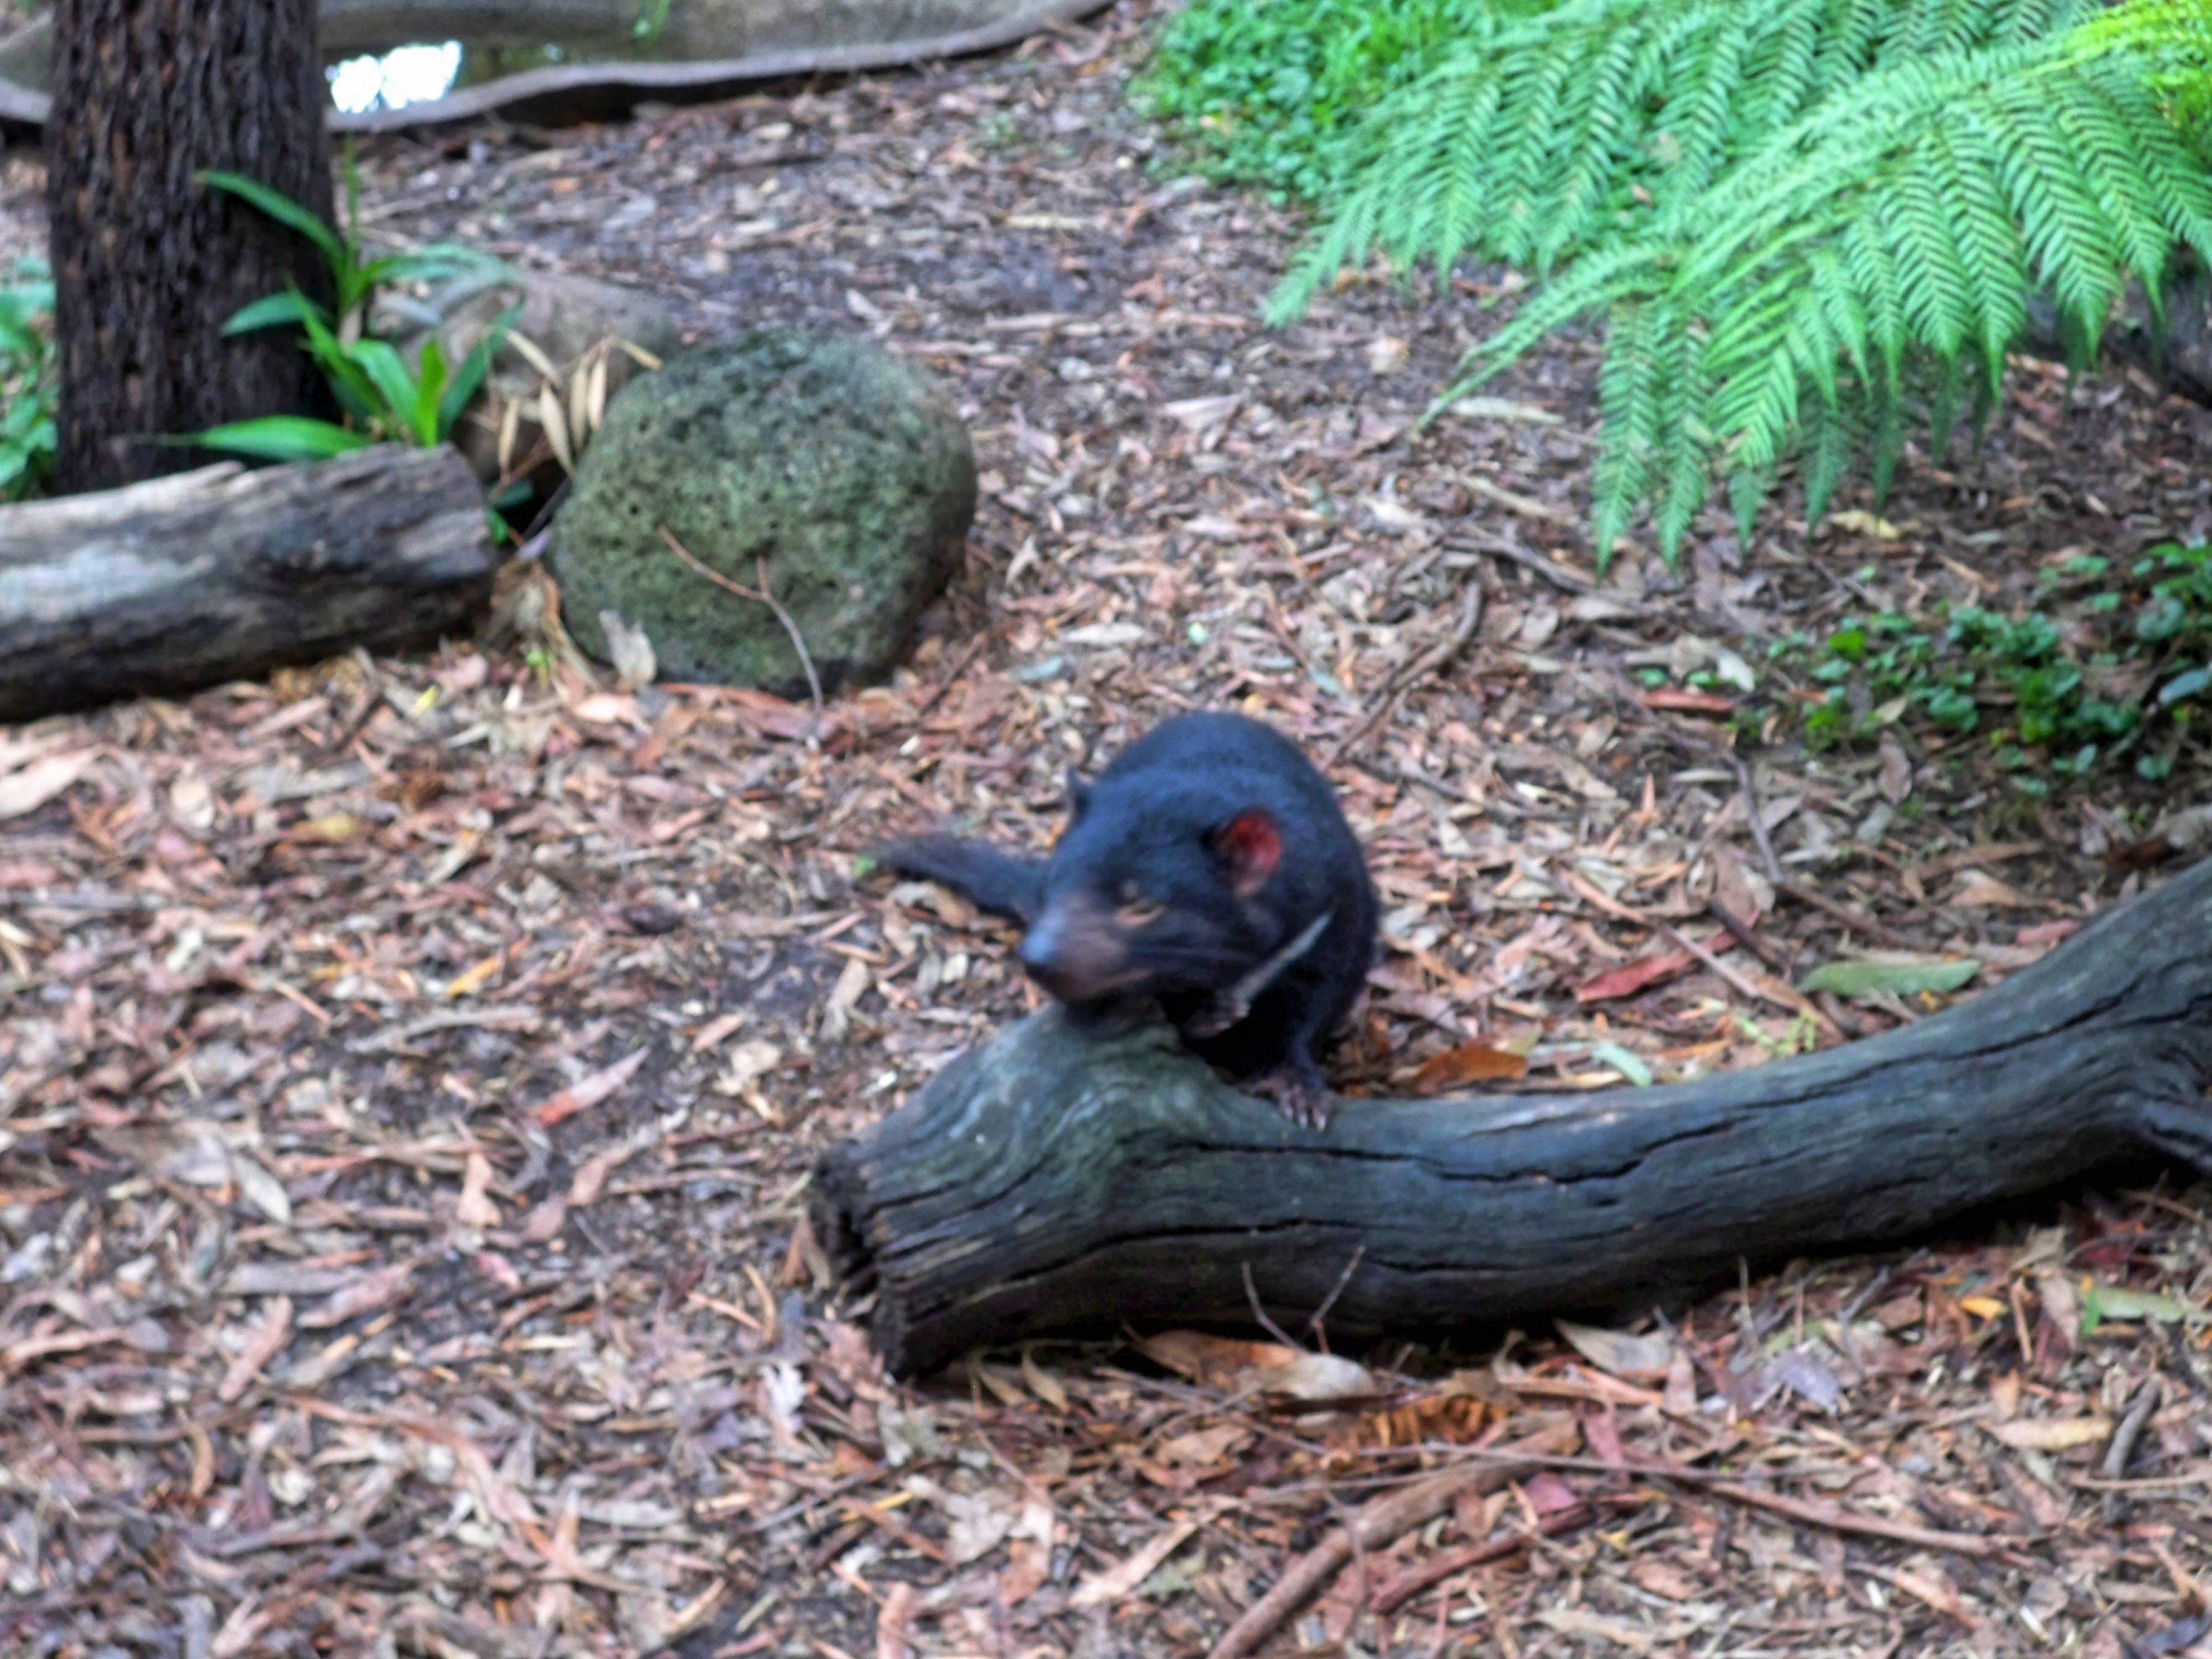 Tasmanian-devil-12.jpeg